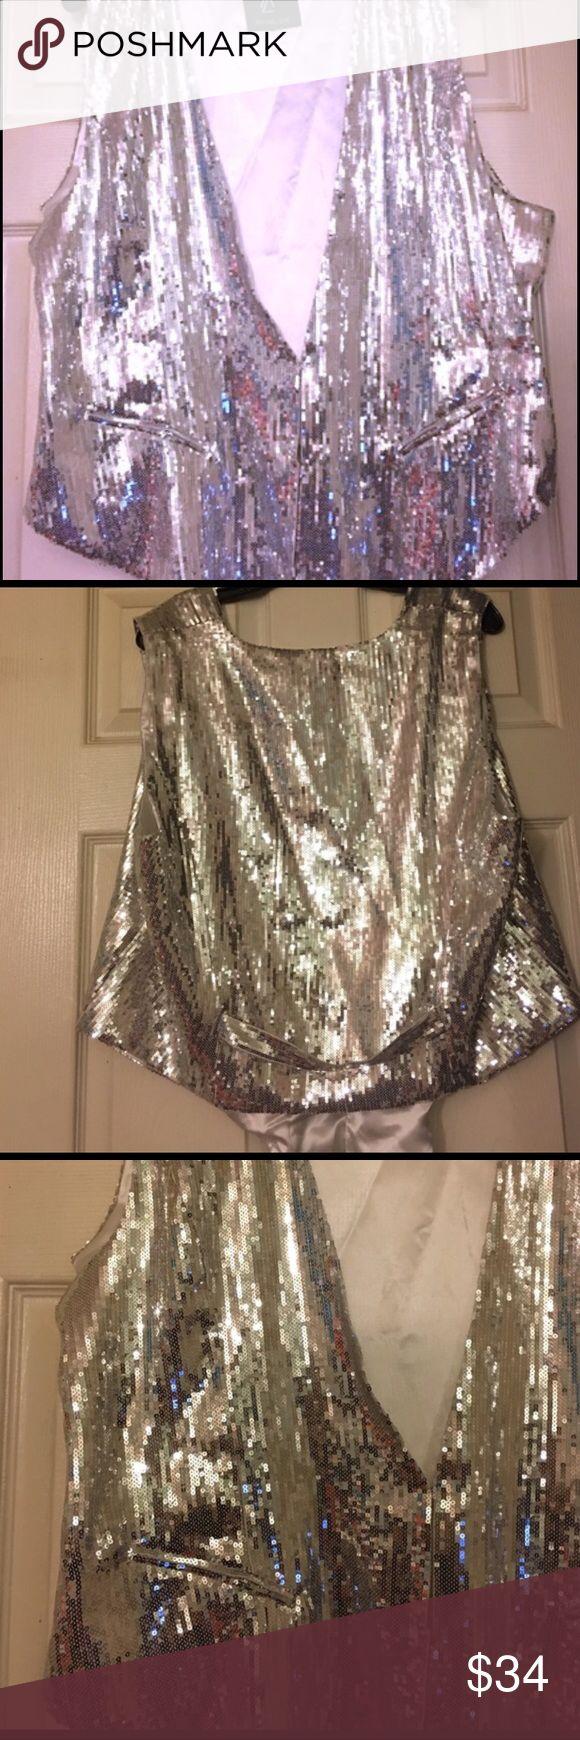 SEQUIN VEST TUXEDO STYLE by RACHEL ZOE! NWOT NWOT TUXEDO STYLE SEQUIN silver vest by Rachel Zoe! All you need is this perfect vest for your event! Accessories not necessary ! Rachel Zoe Jackets & Coats Vests